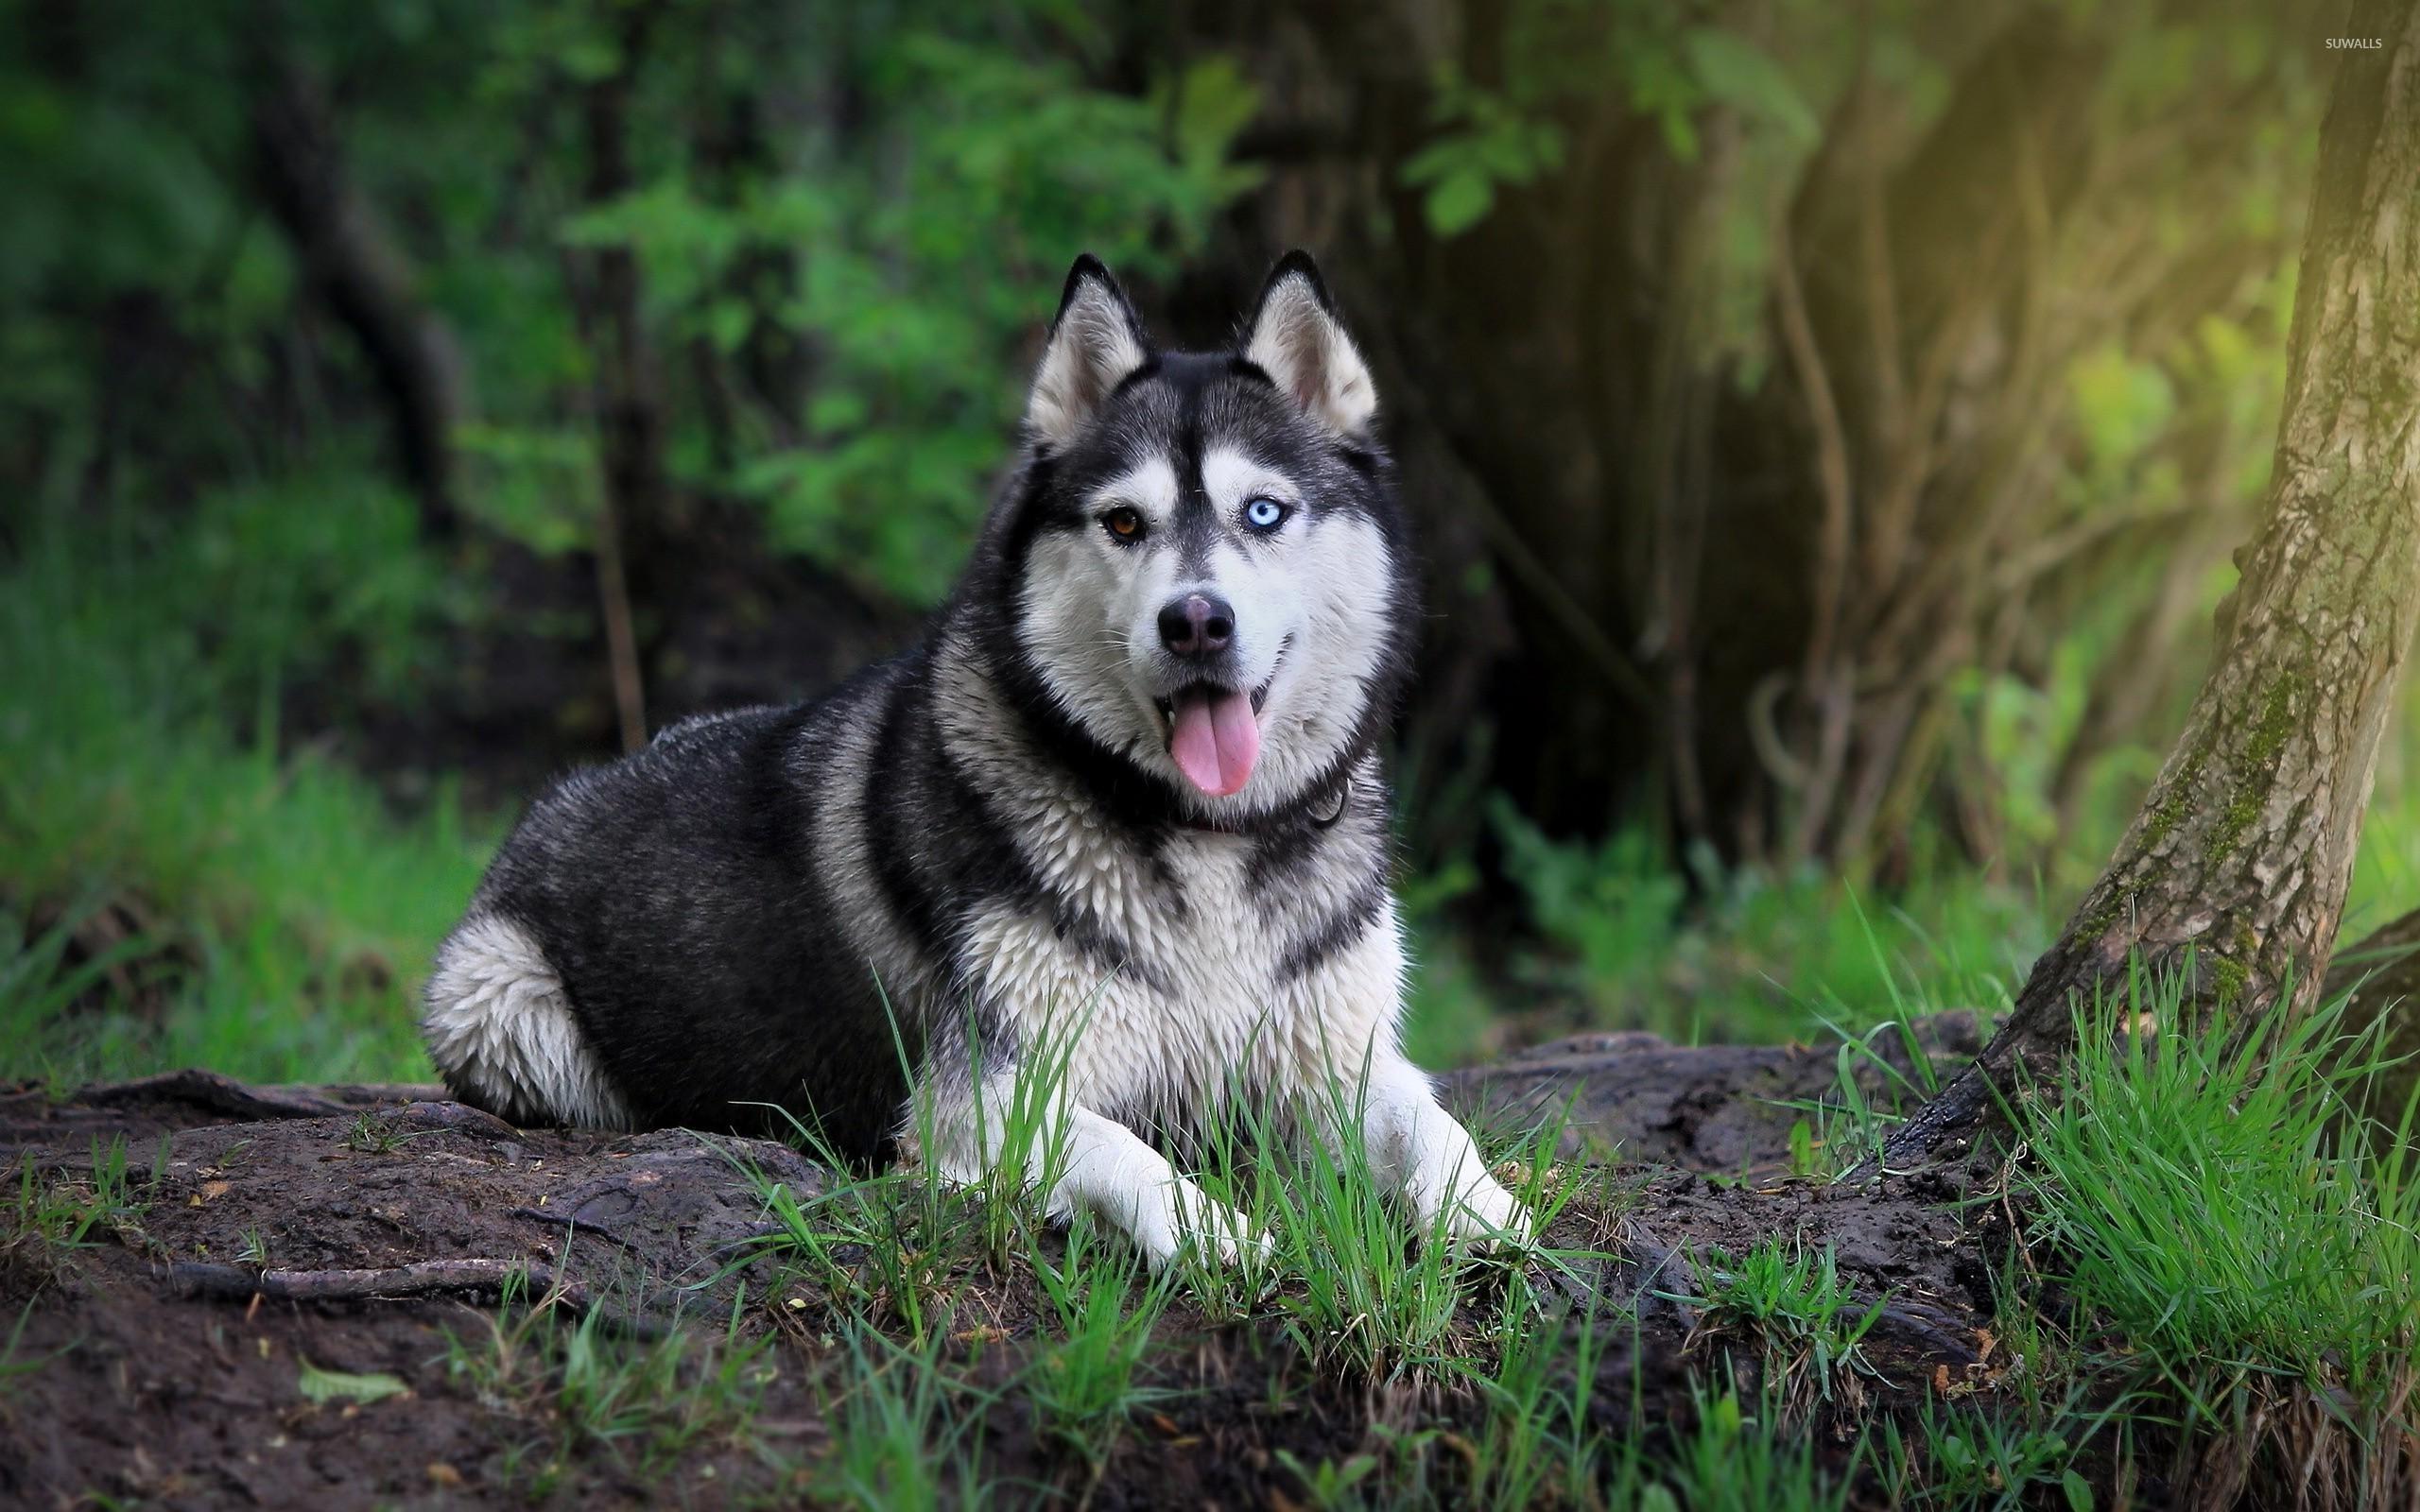 Siberian Husky in the forest wallpaper